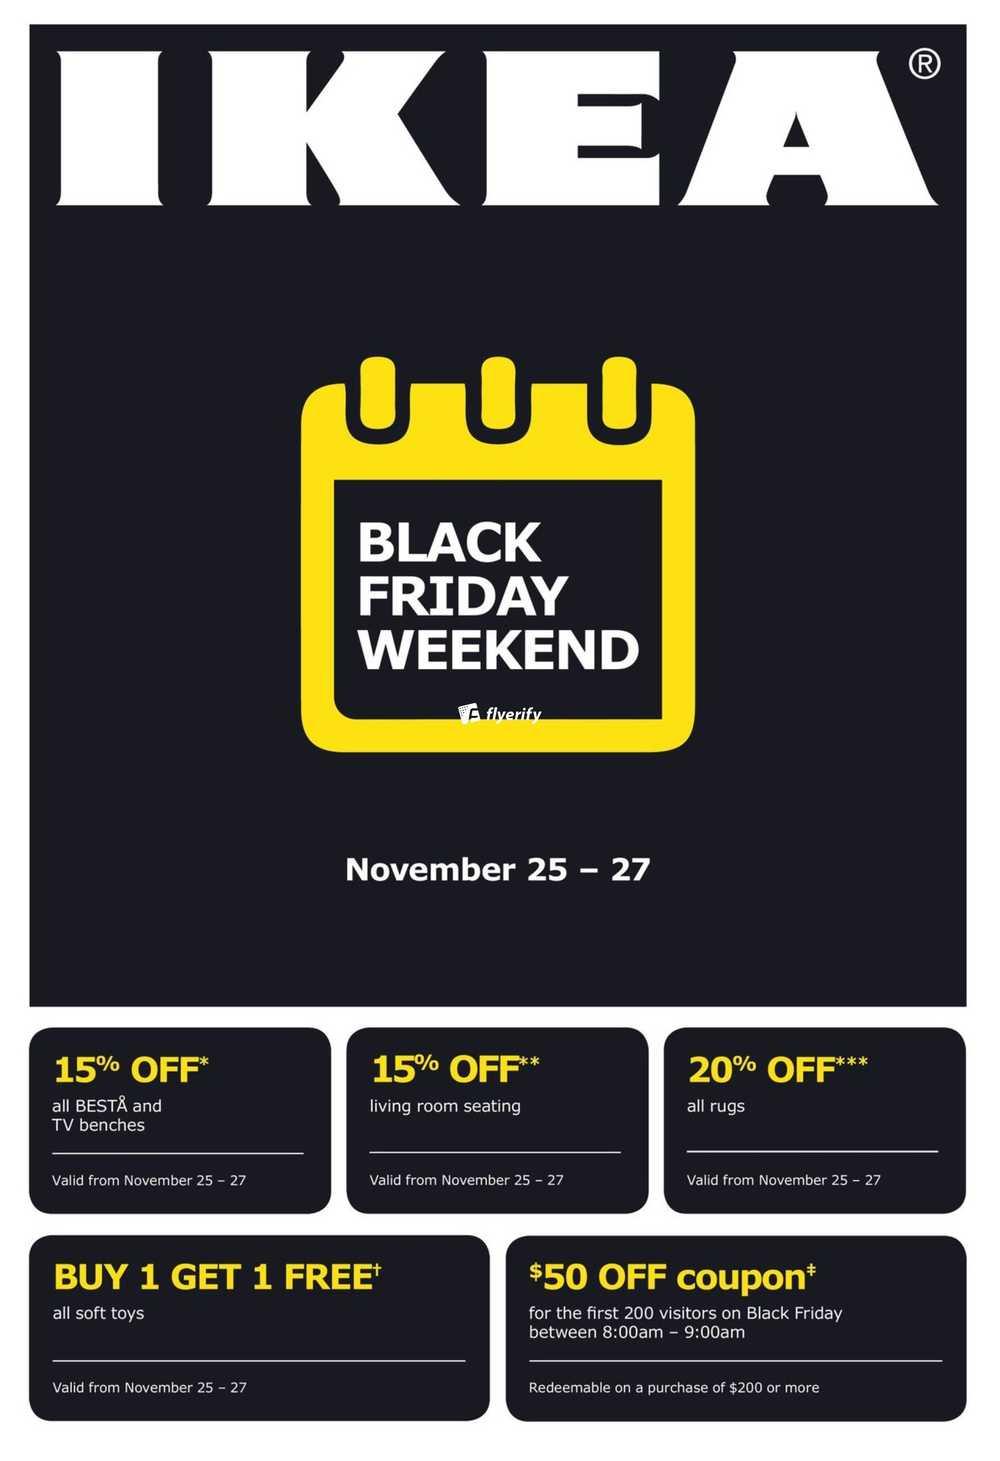 ikea black friday weekend flyer november 25 to 27 canada. Black Bedroom Furniture Sets. Home Design Ideas